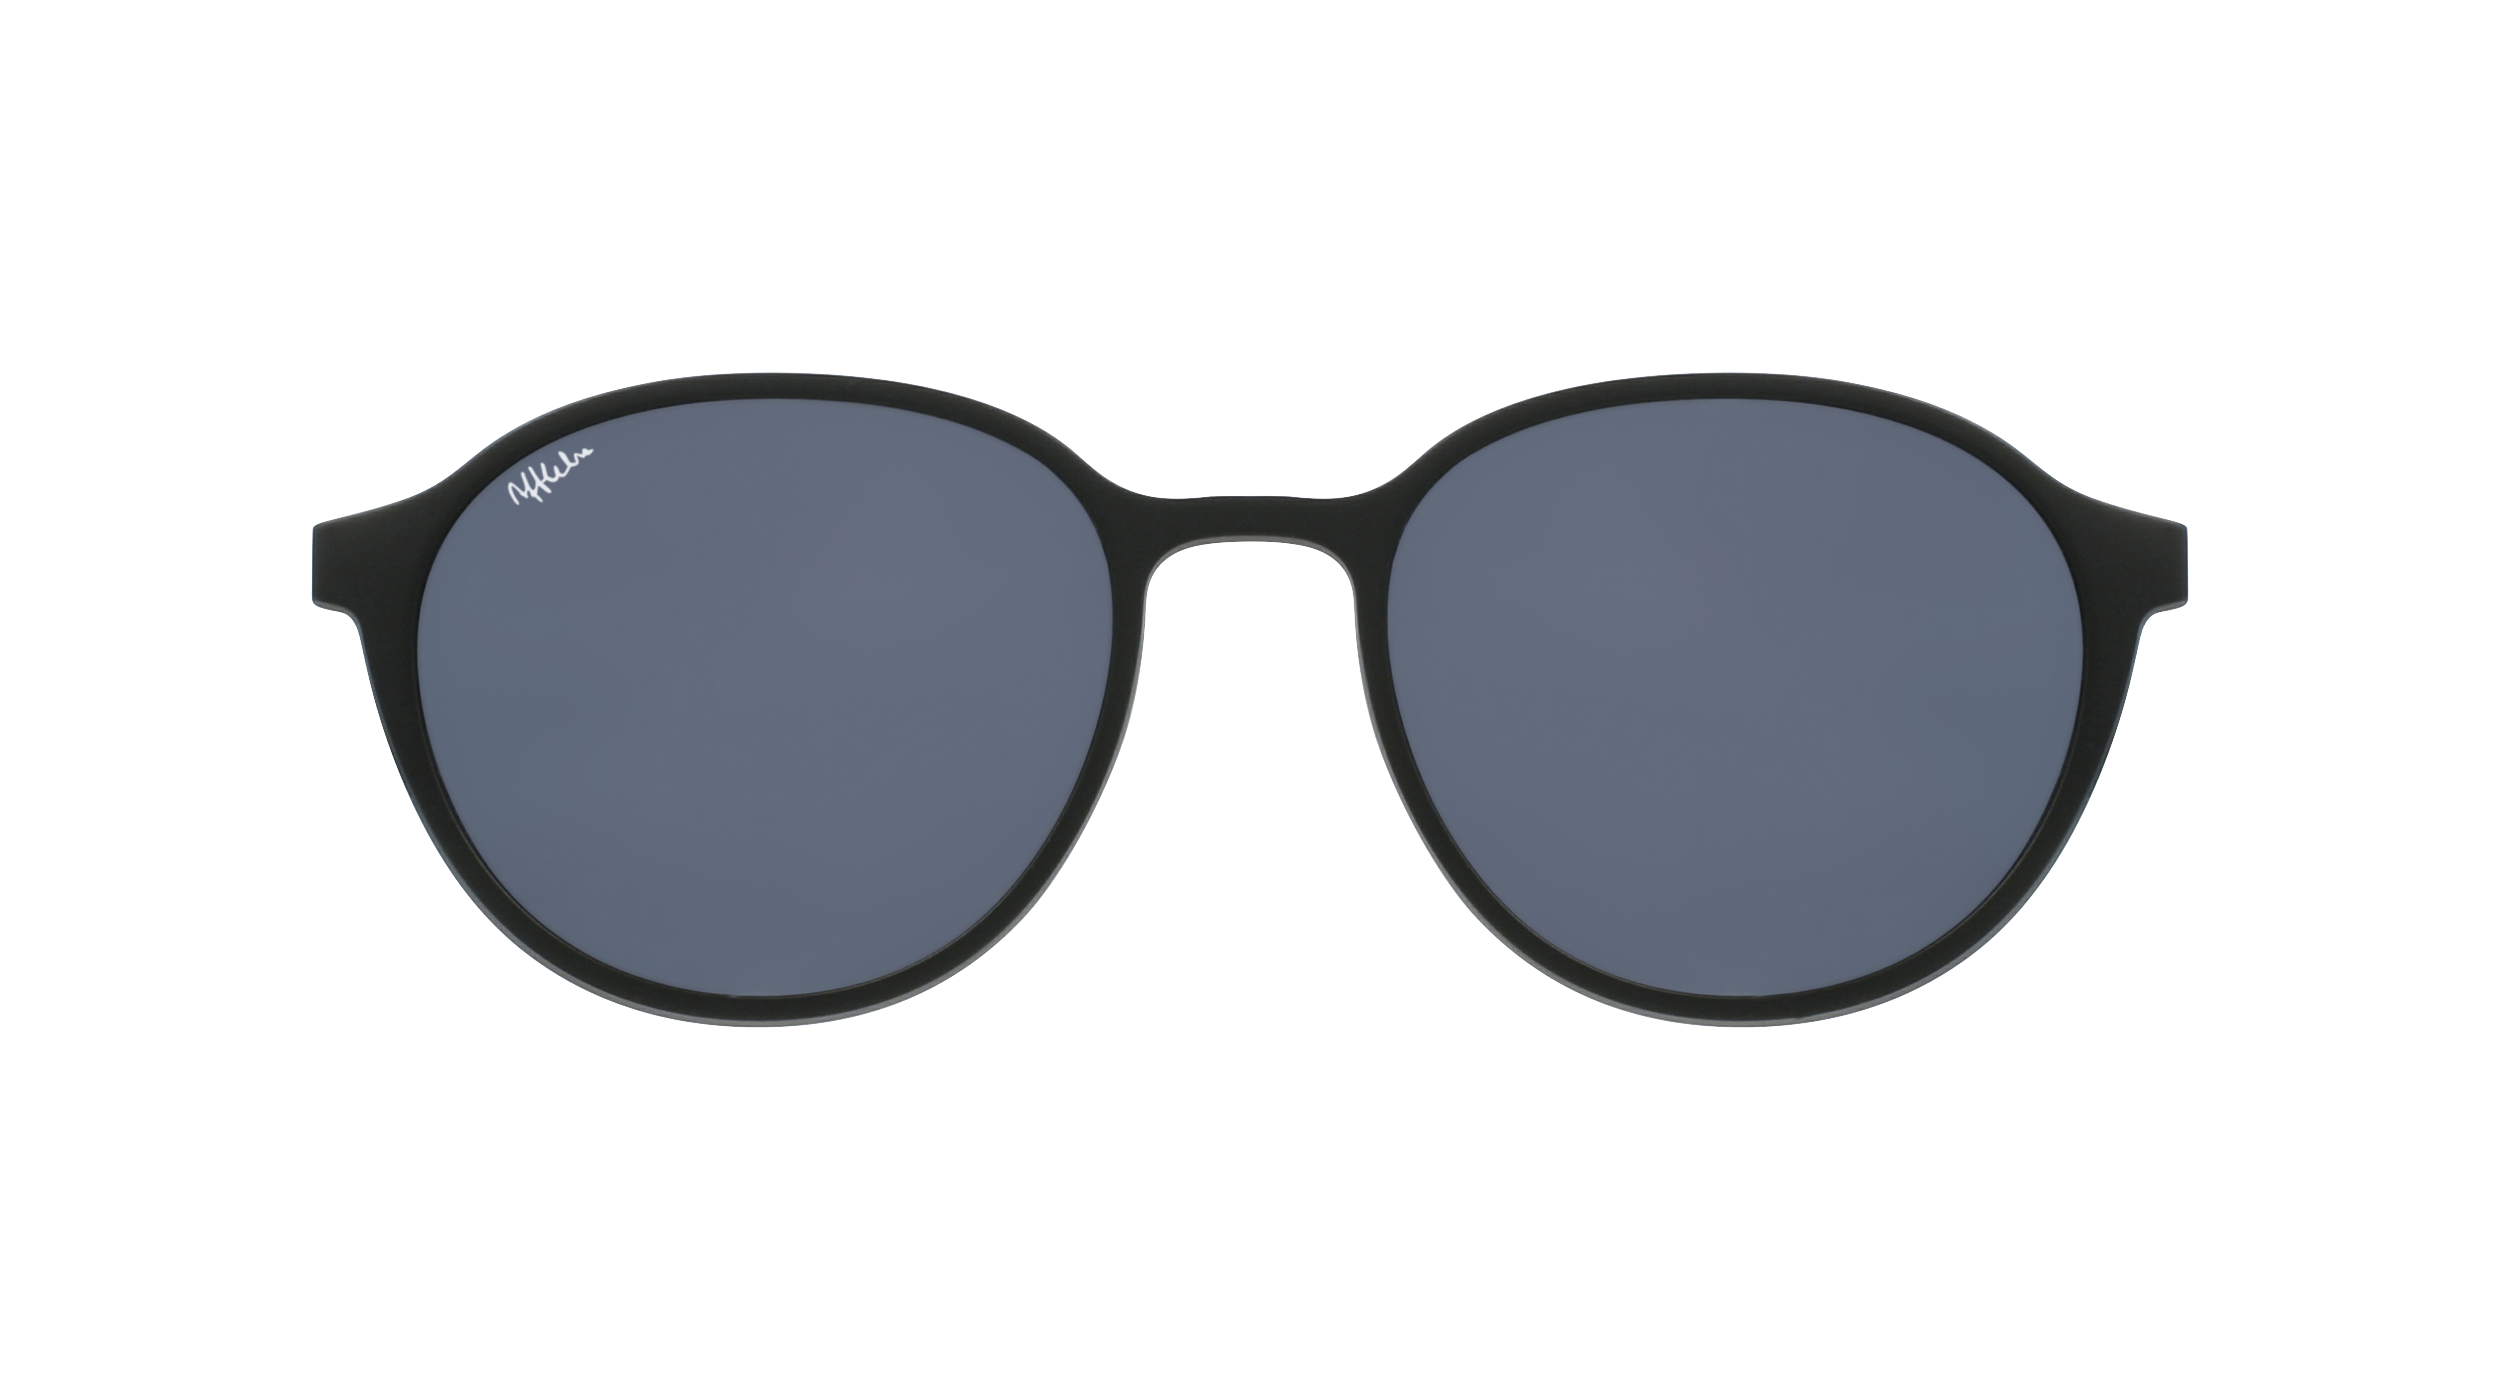 afflelou/france/products/smart_clip/clips_glasses/07630036458730.png